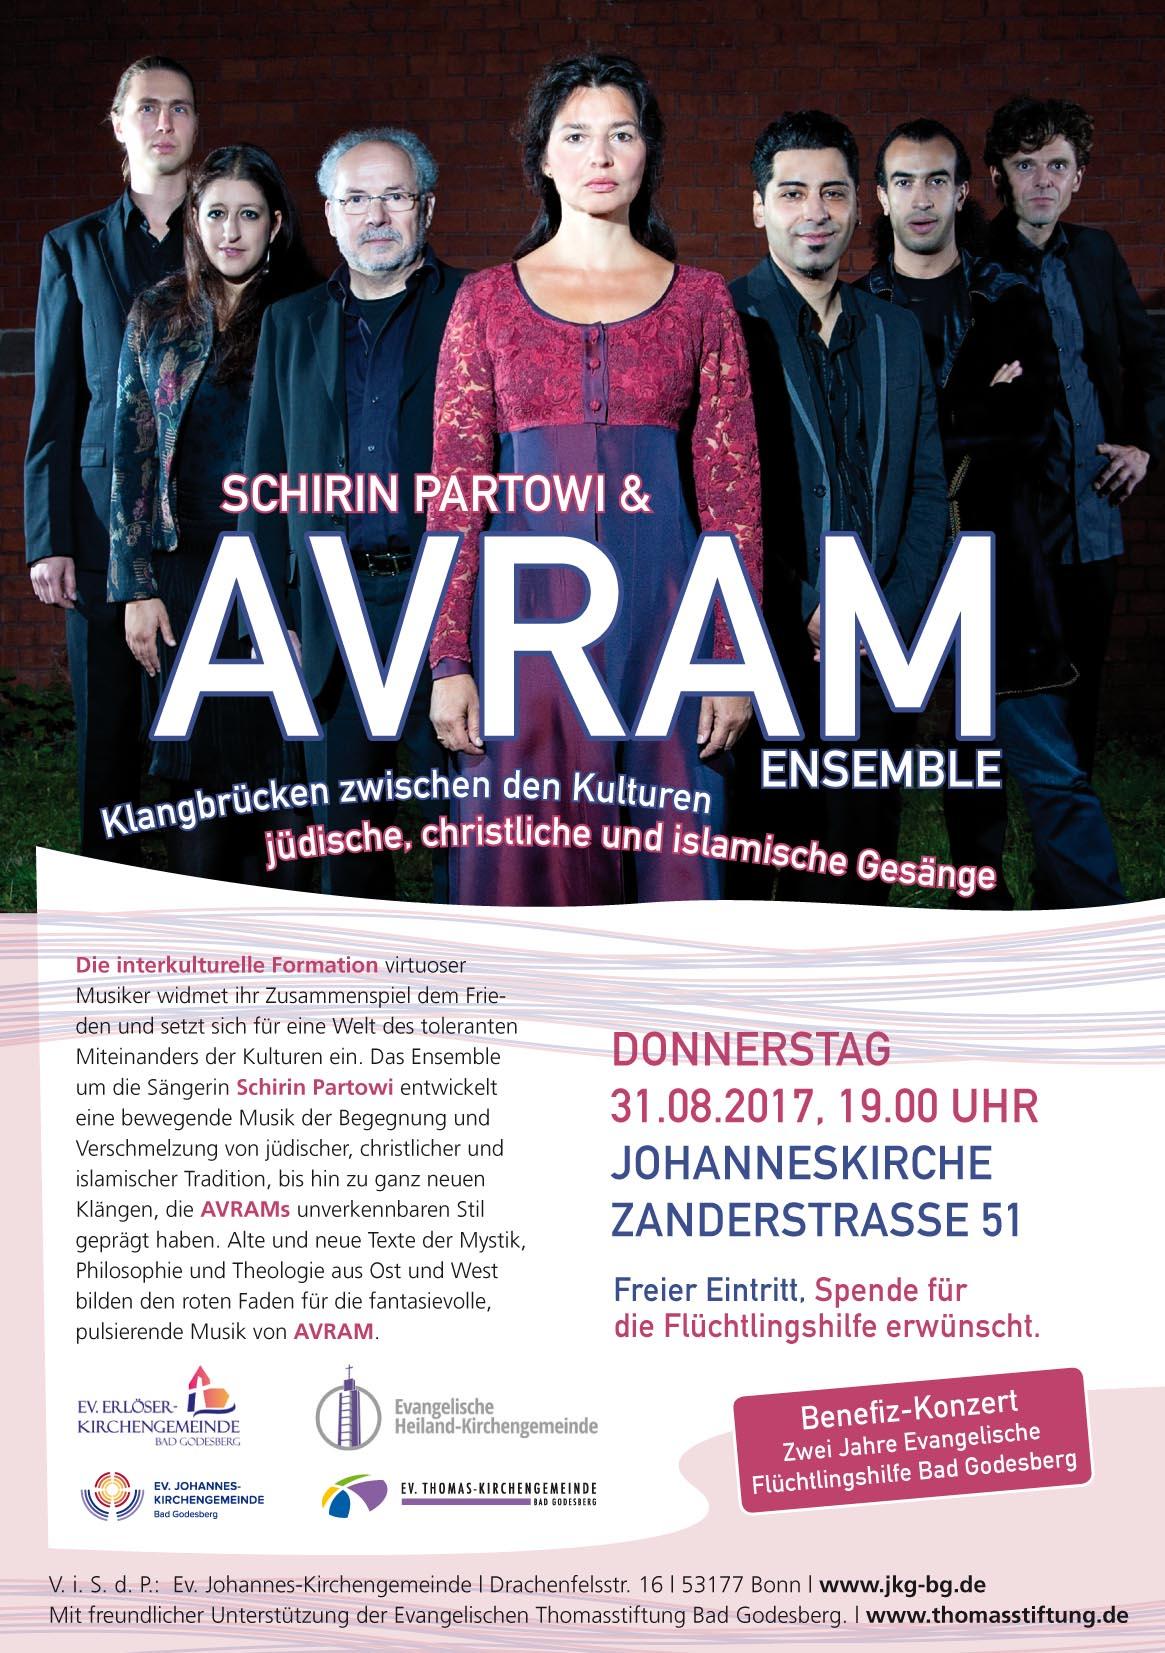 Avram_DINA5.indd